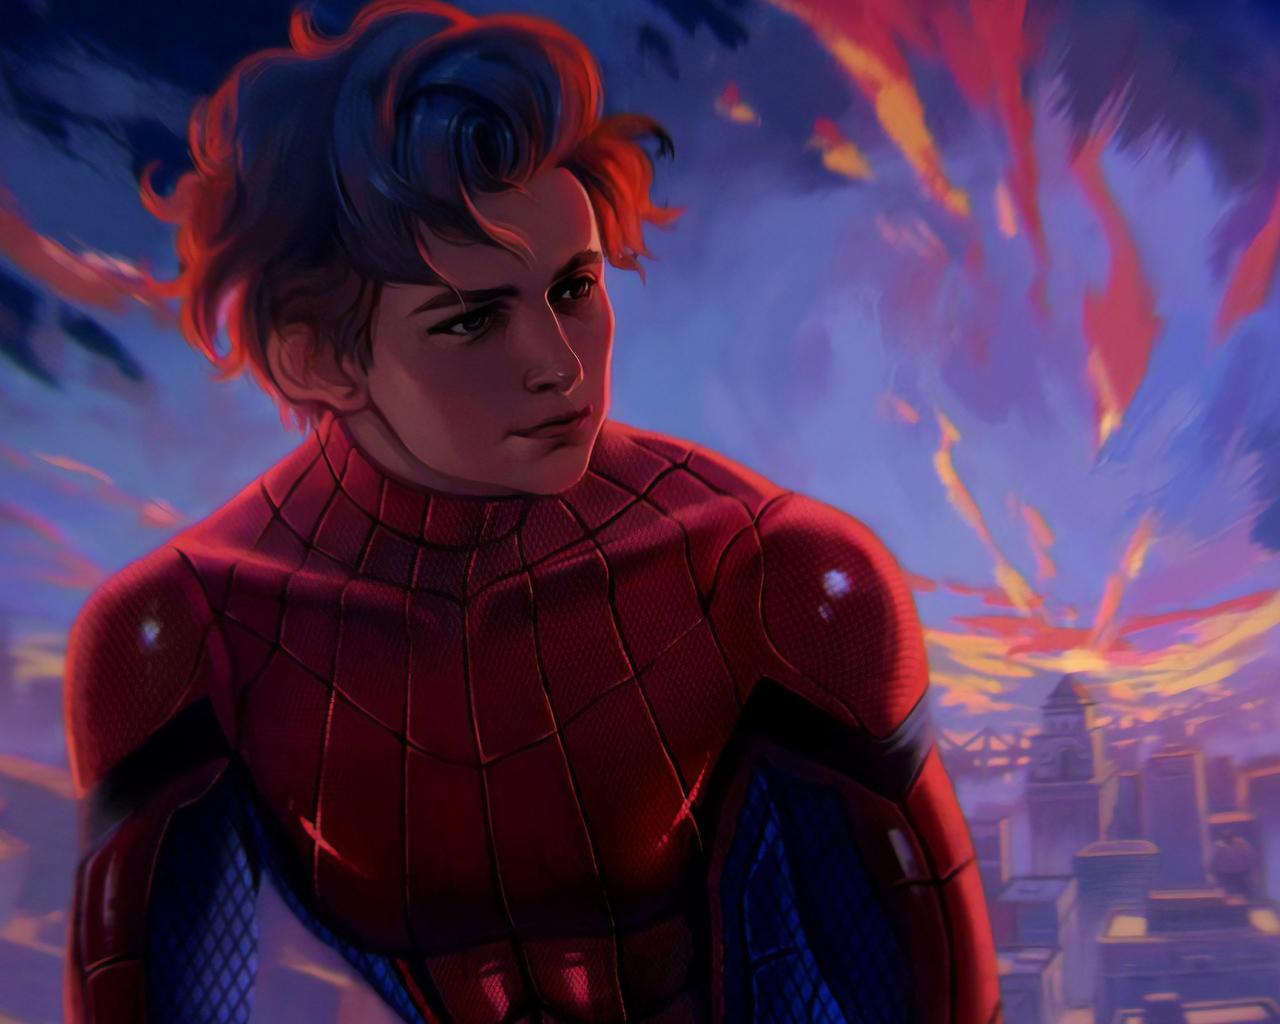 spider-man-homecoming-4k-7l.jpg